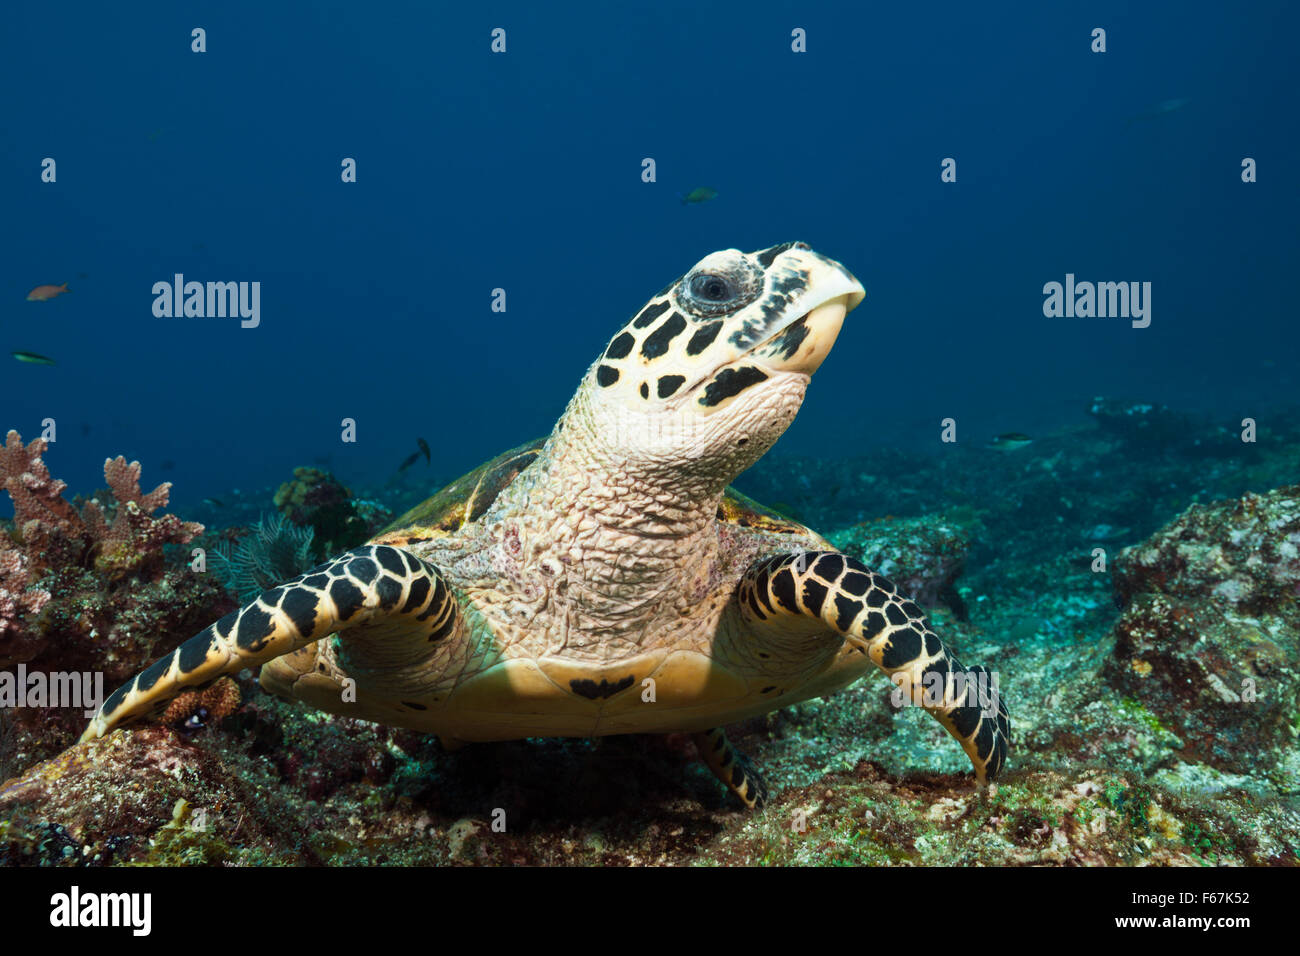 Hawksbill Sea Turtle, Eretmochelys imbricata, Komodo National Park, Indonesia - Stock Image